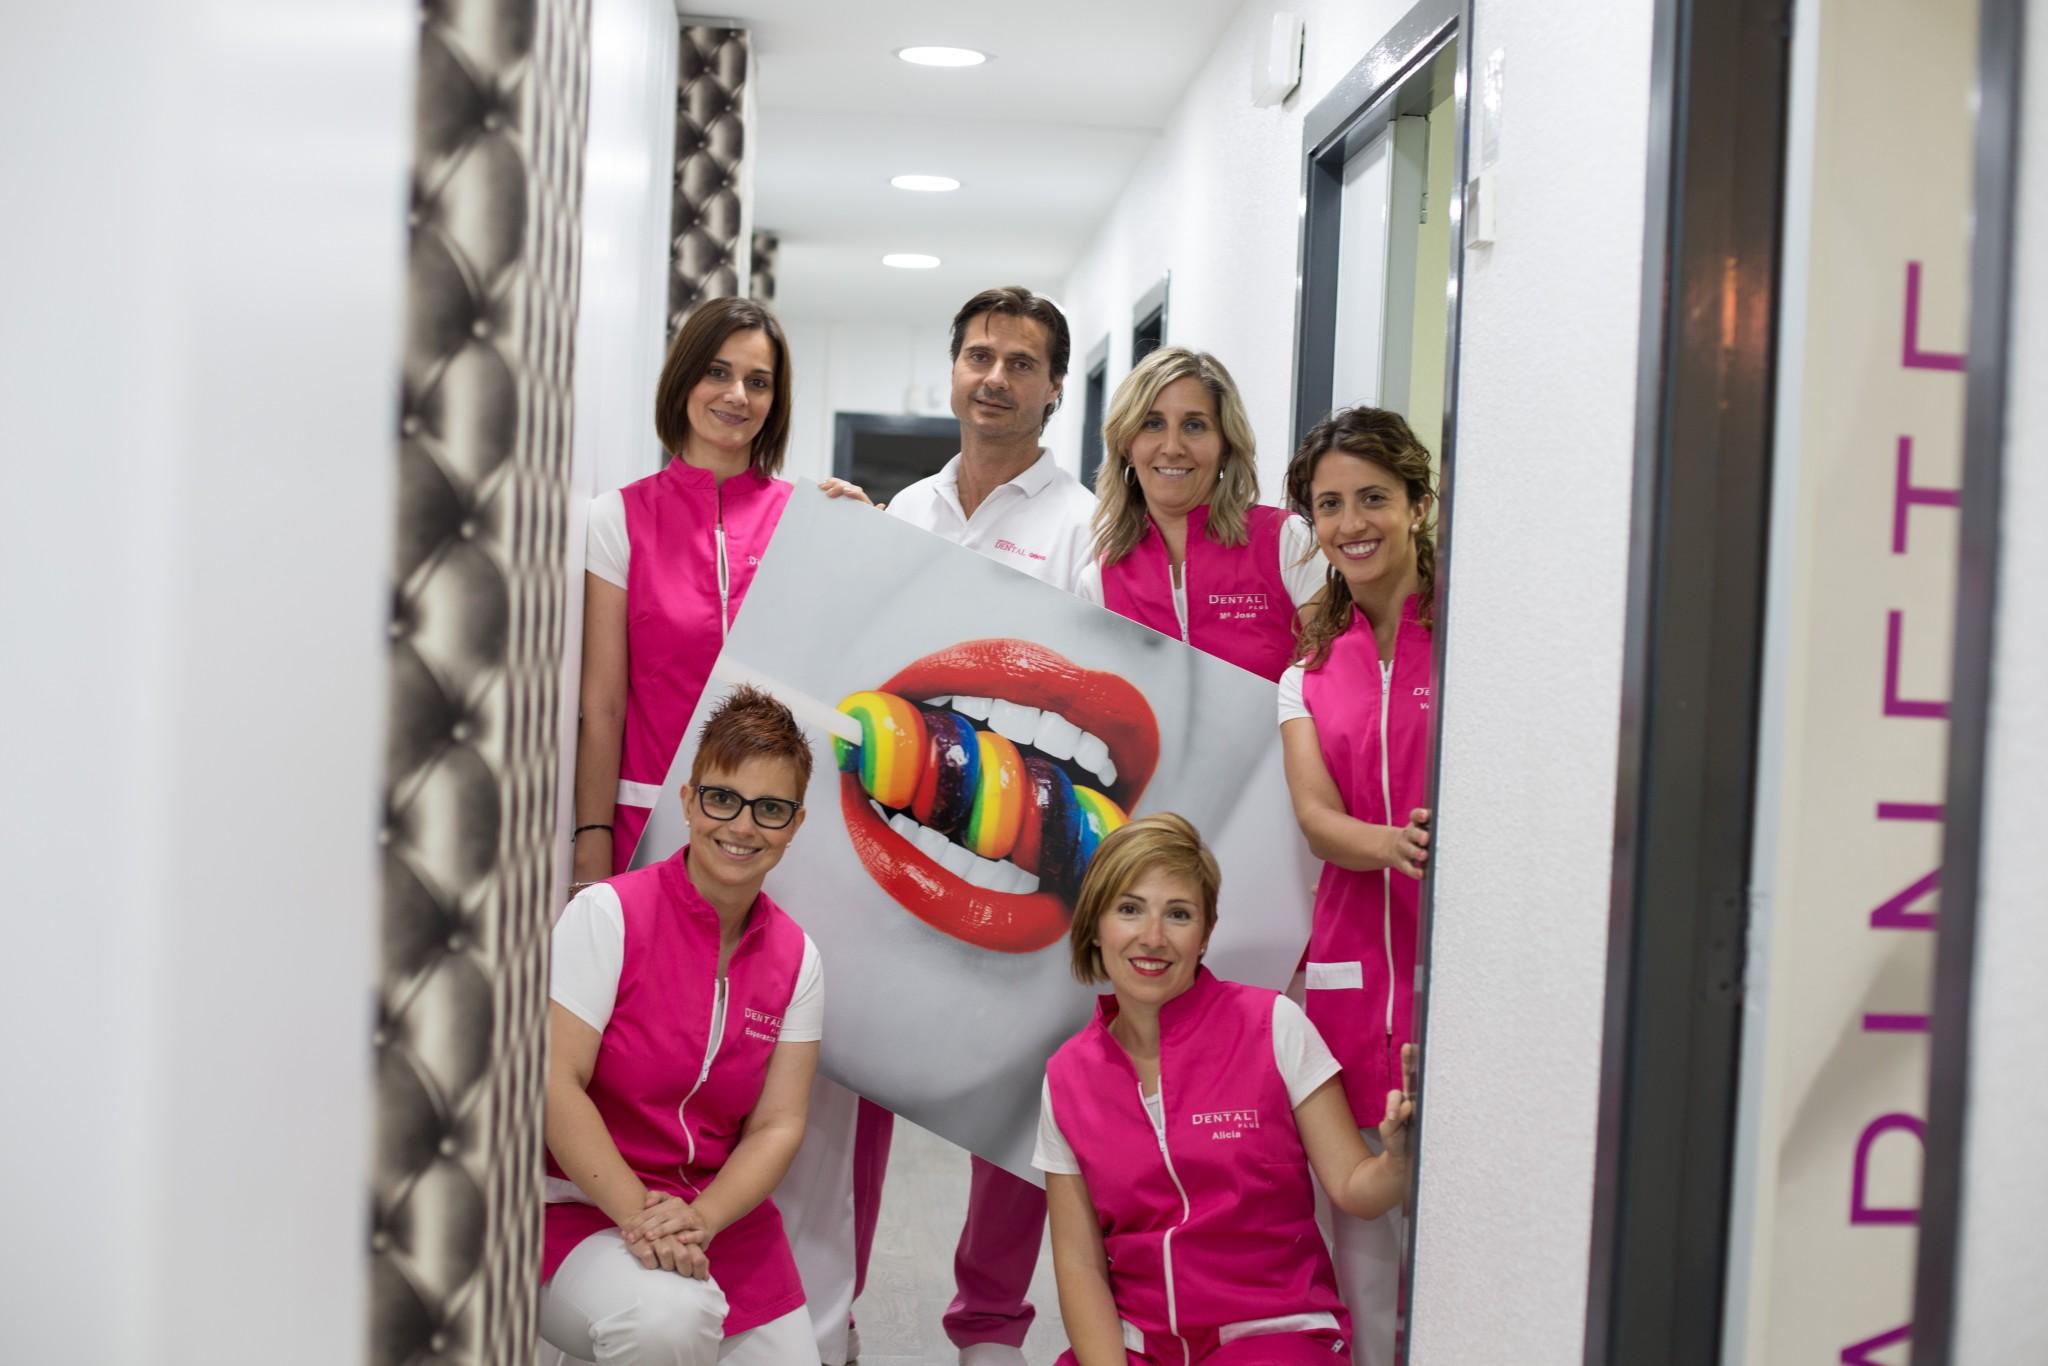 Equipo Clínica Dental Asistencia Dental Plus Valencia